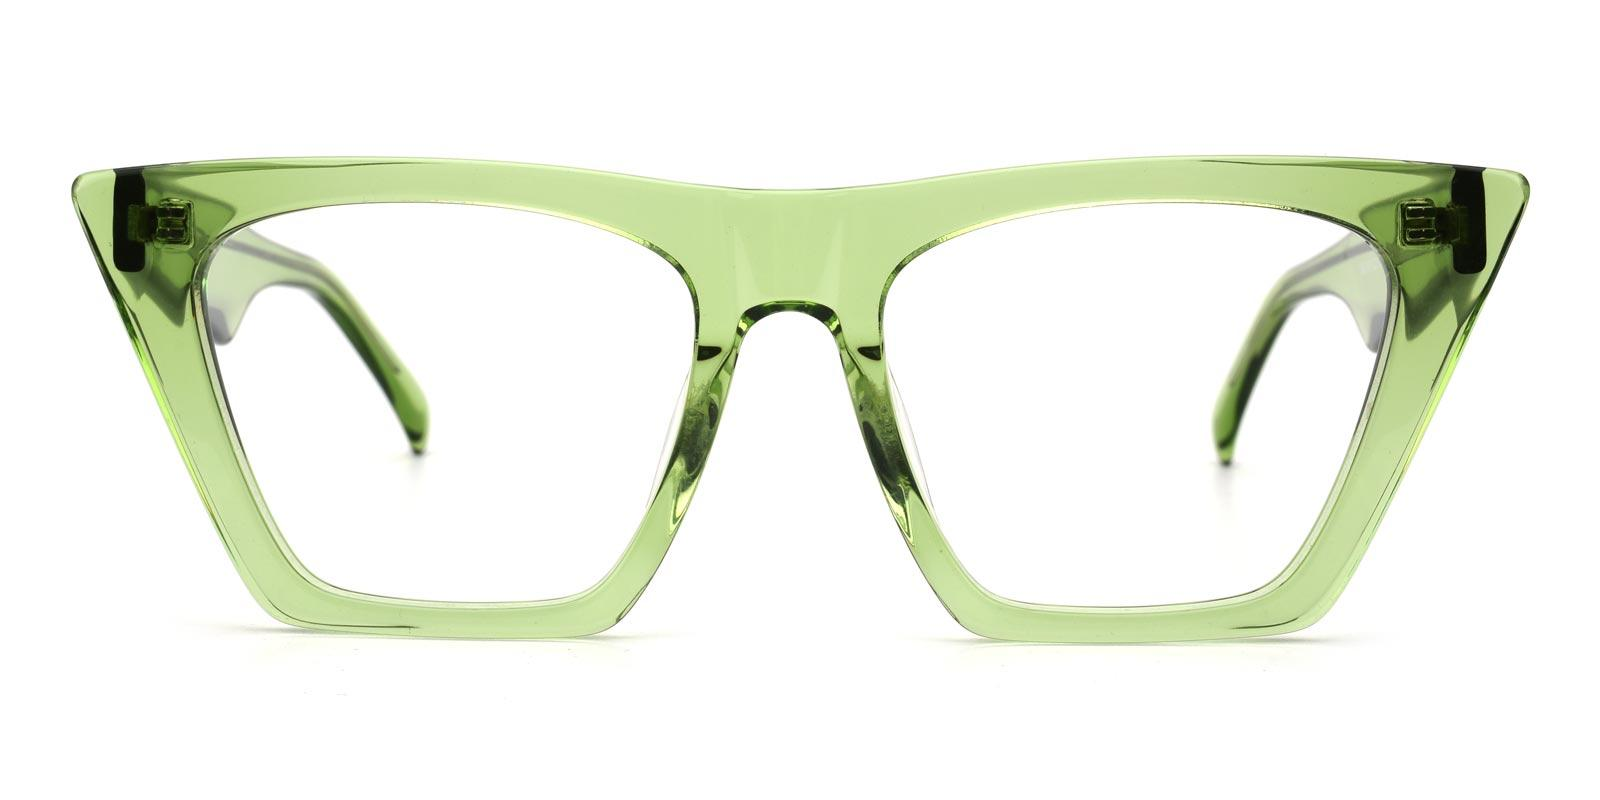 Alva-Green-Cat-Acetate-Eyeglasses-additional2